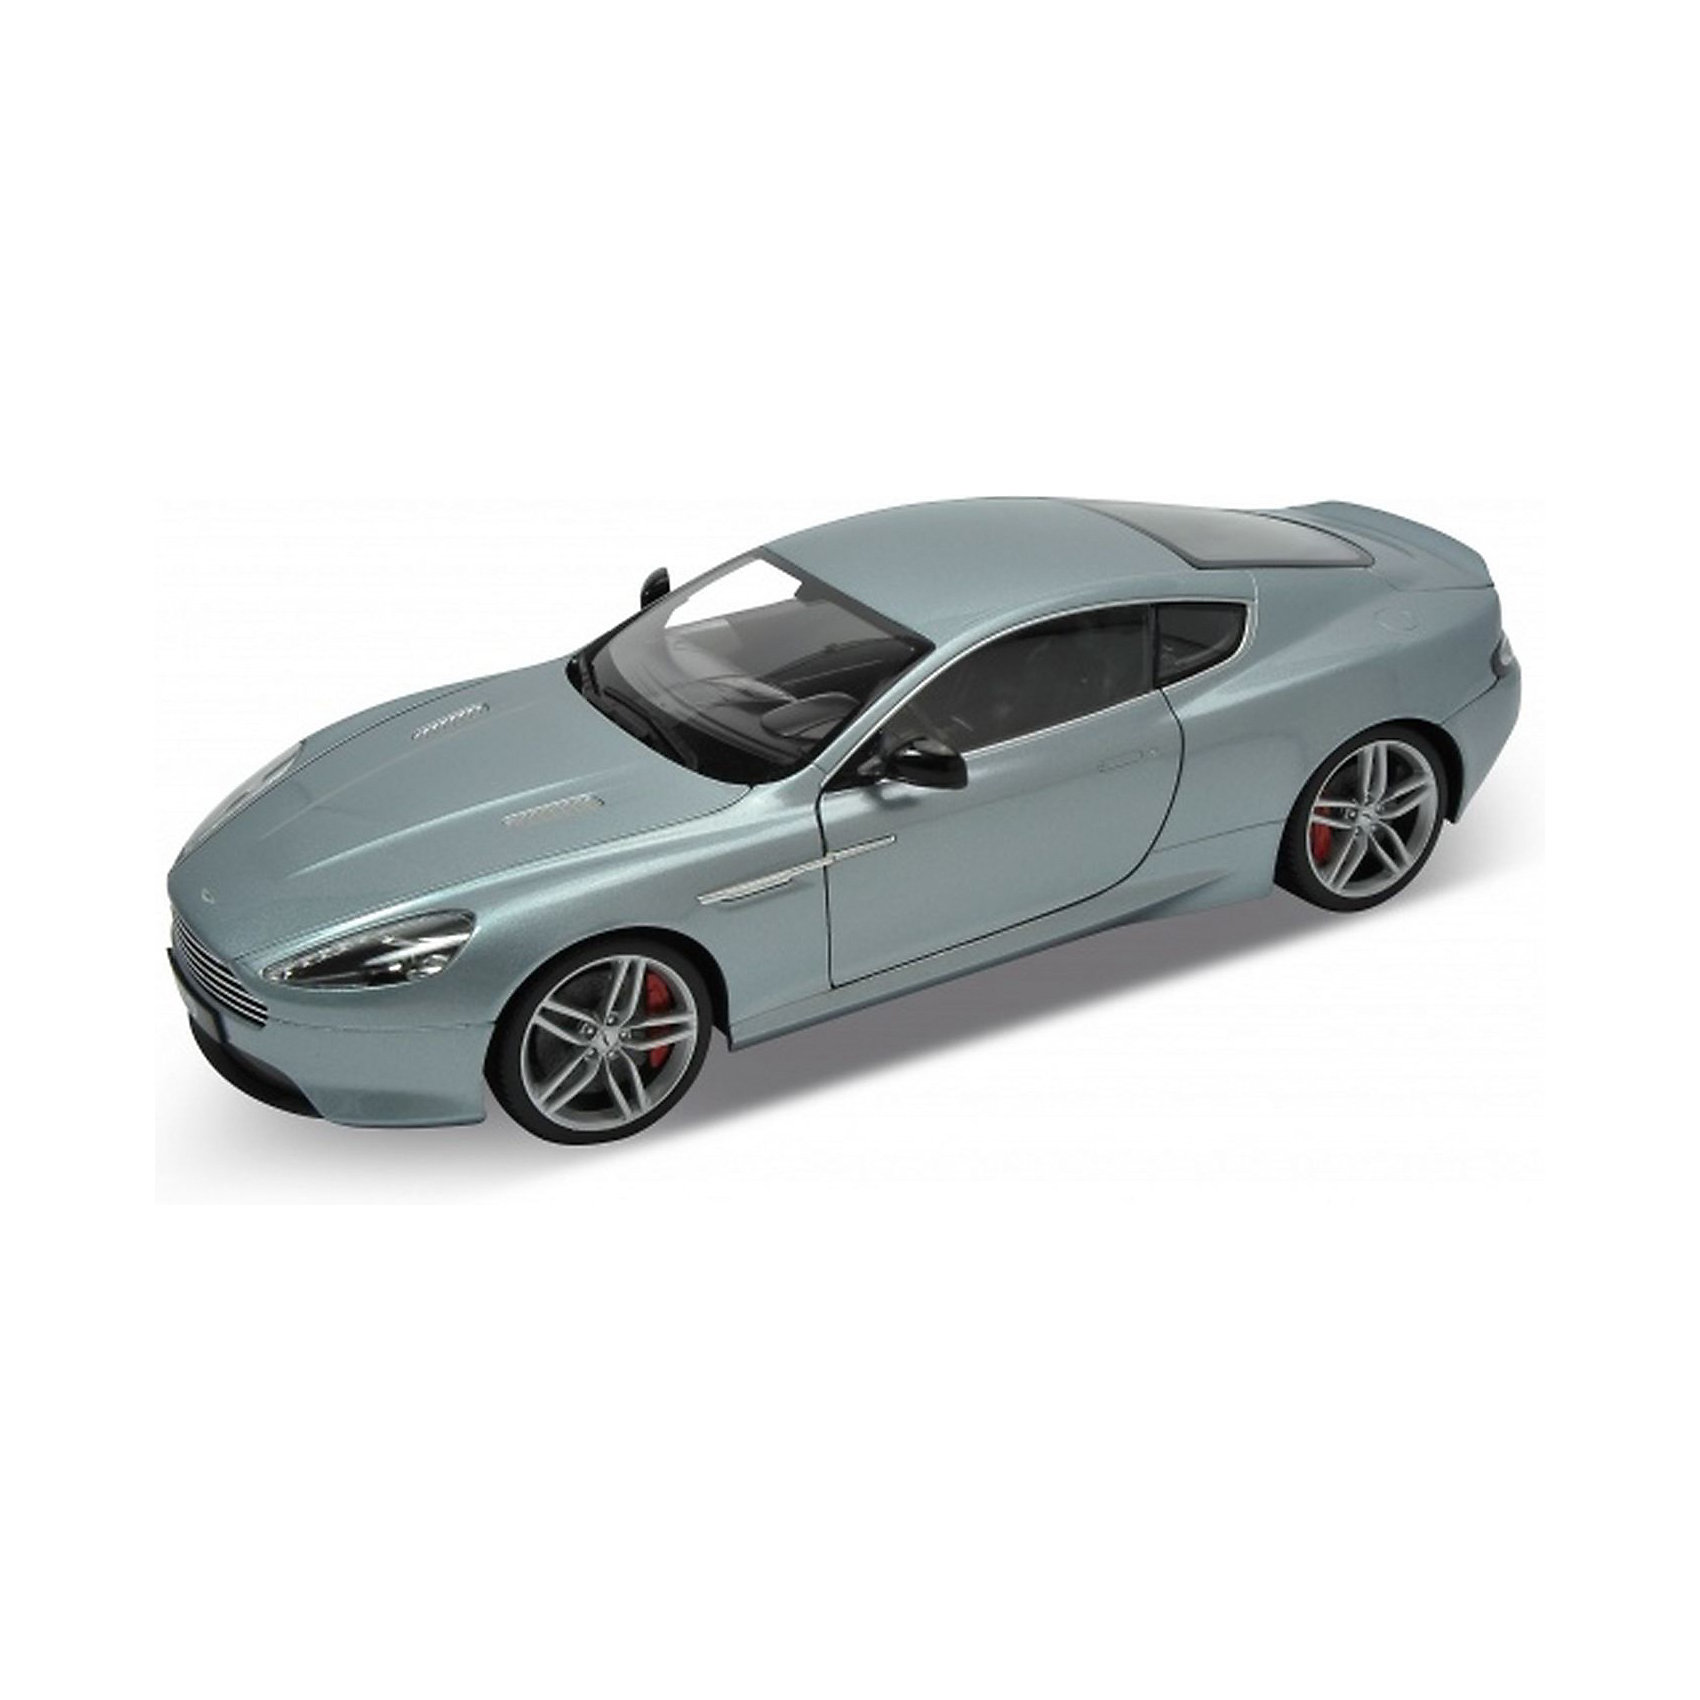 Welly Модель машины 1:18 Aston Martin DB9, Welly машины welly модель машины 1 34 39 aston martin v12 vantage